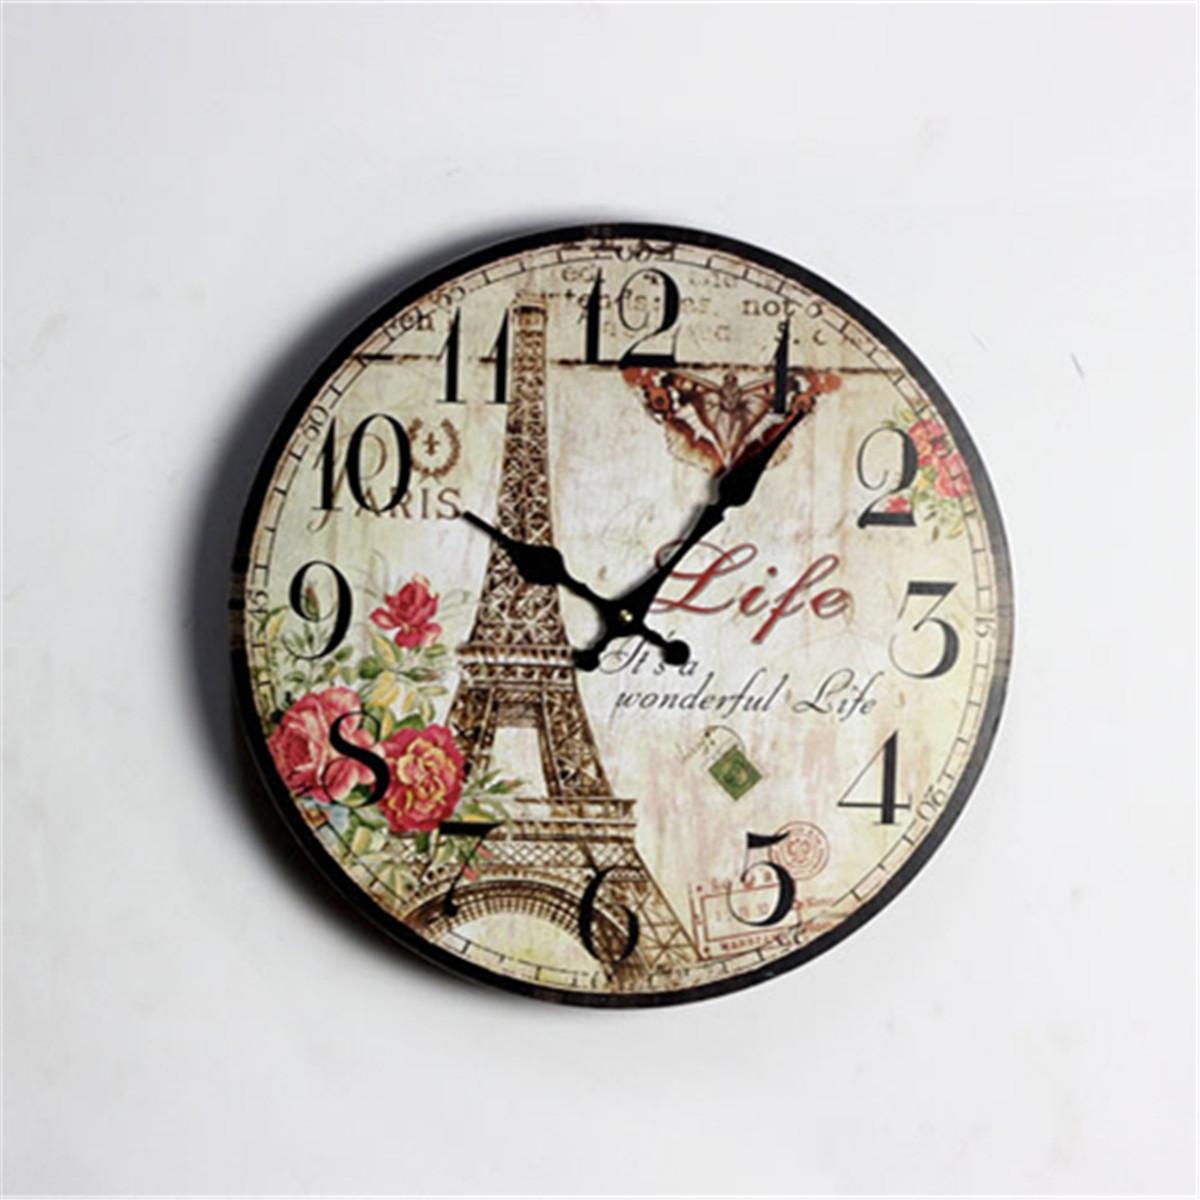 Merveilleux Wall Clock Eiffel Tower Flower Numbers Retro Vintage Home Decor Round Retro  Wall Clocks Kitchen Rhythm Clock From Autoobder, $9.69| Dhgate.Com